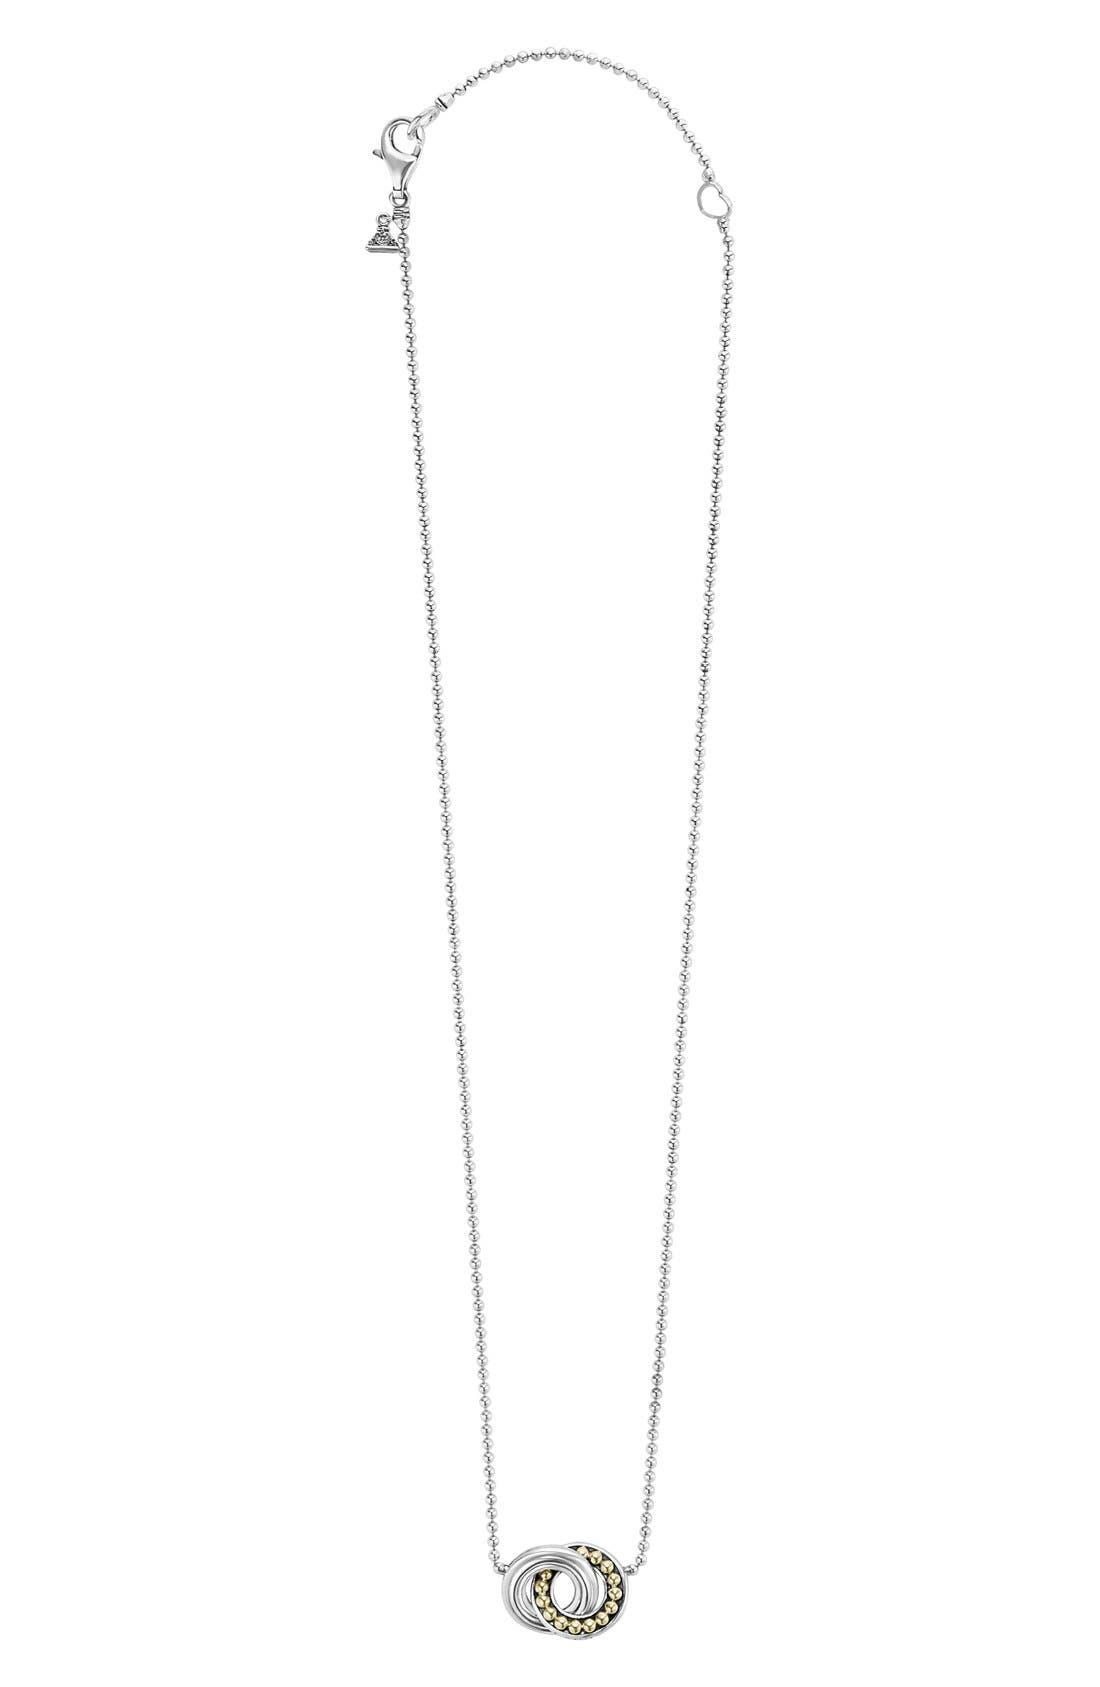 Enso Pendant Necklace,                             Alternate thumbnail 2, color,                             Silver/ Pearl